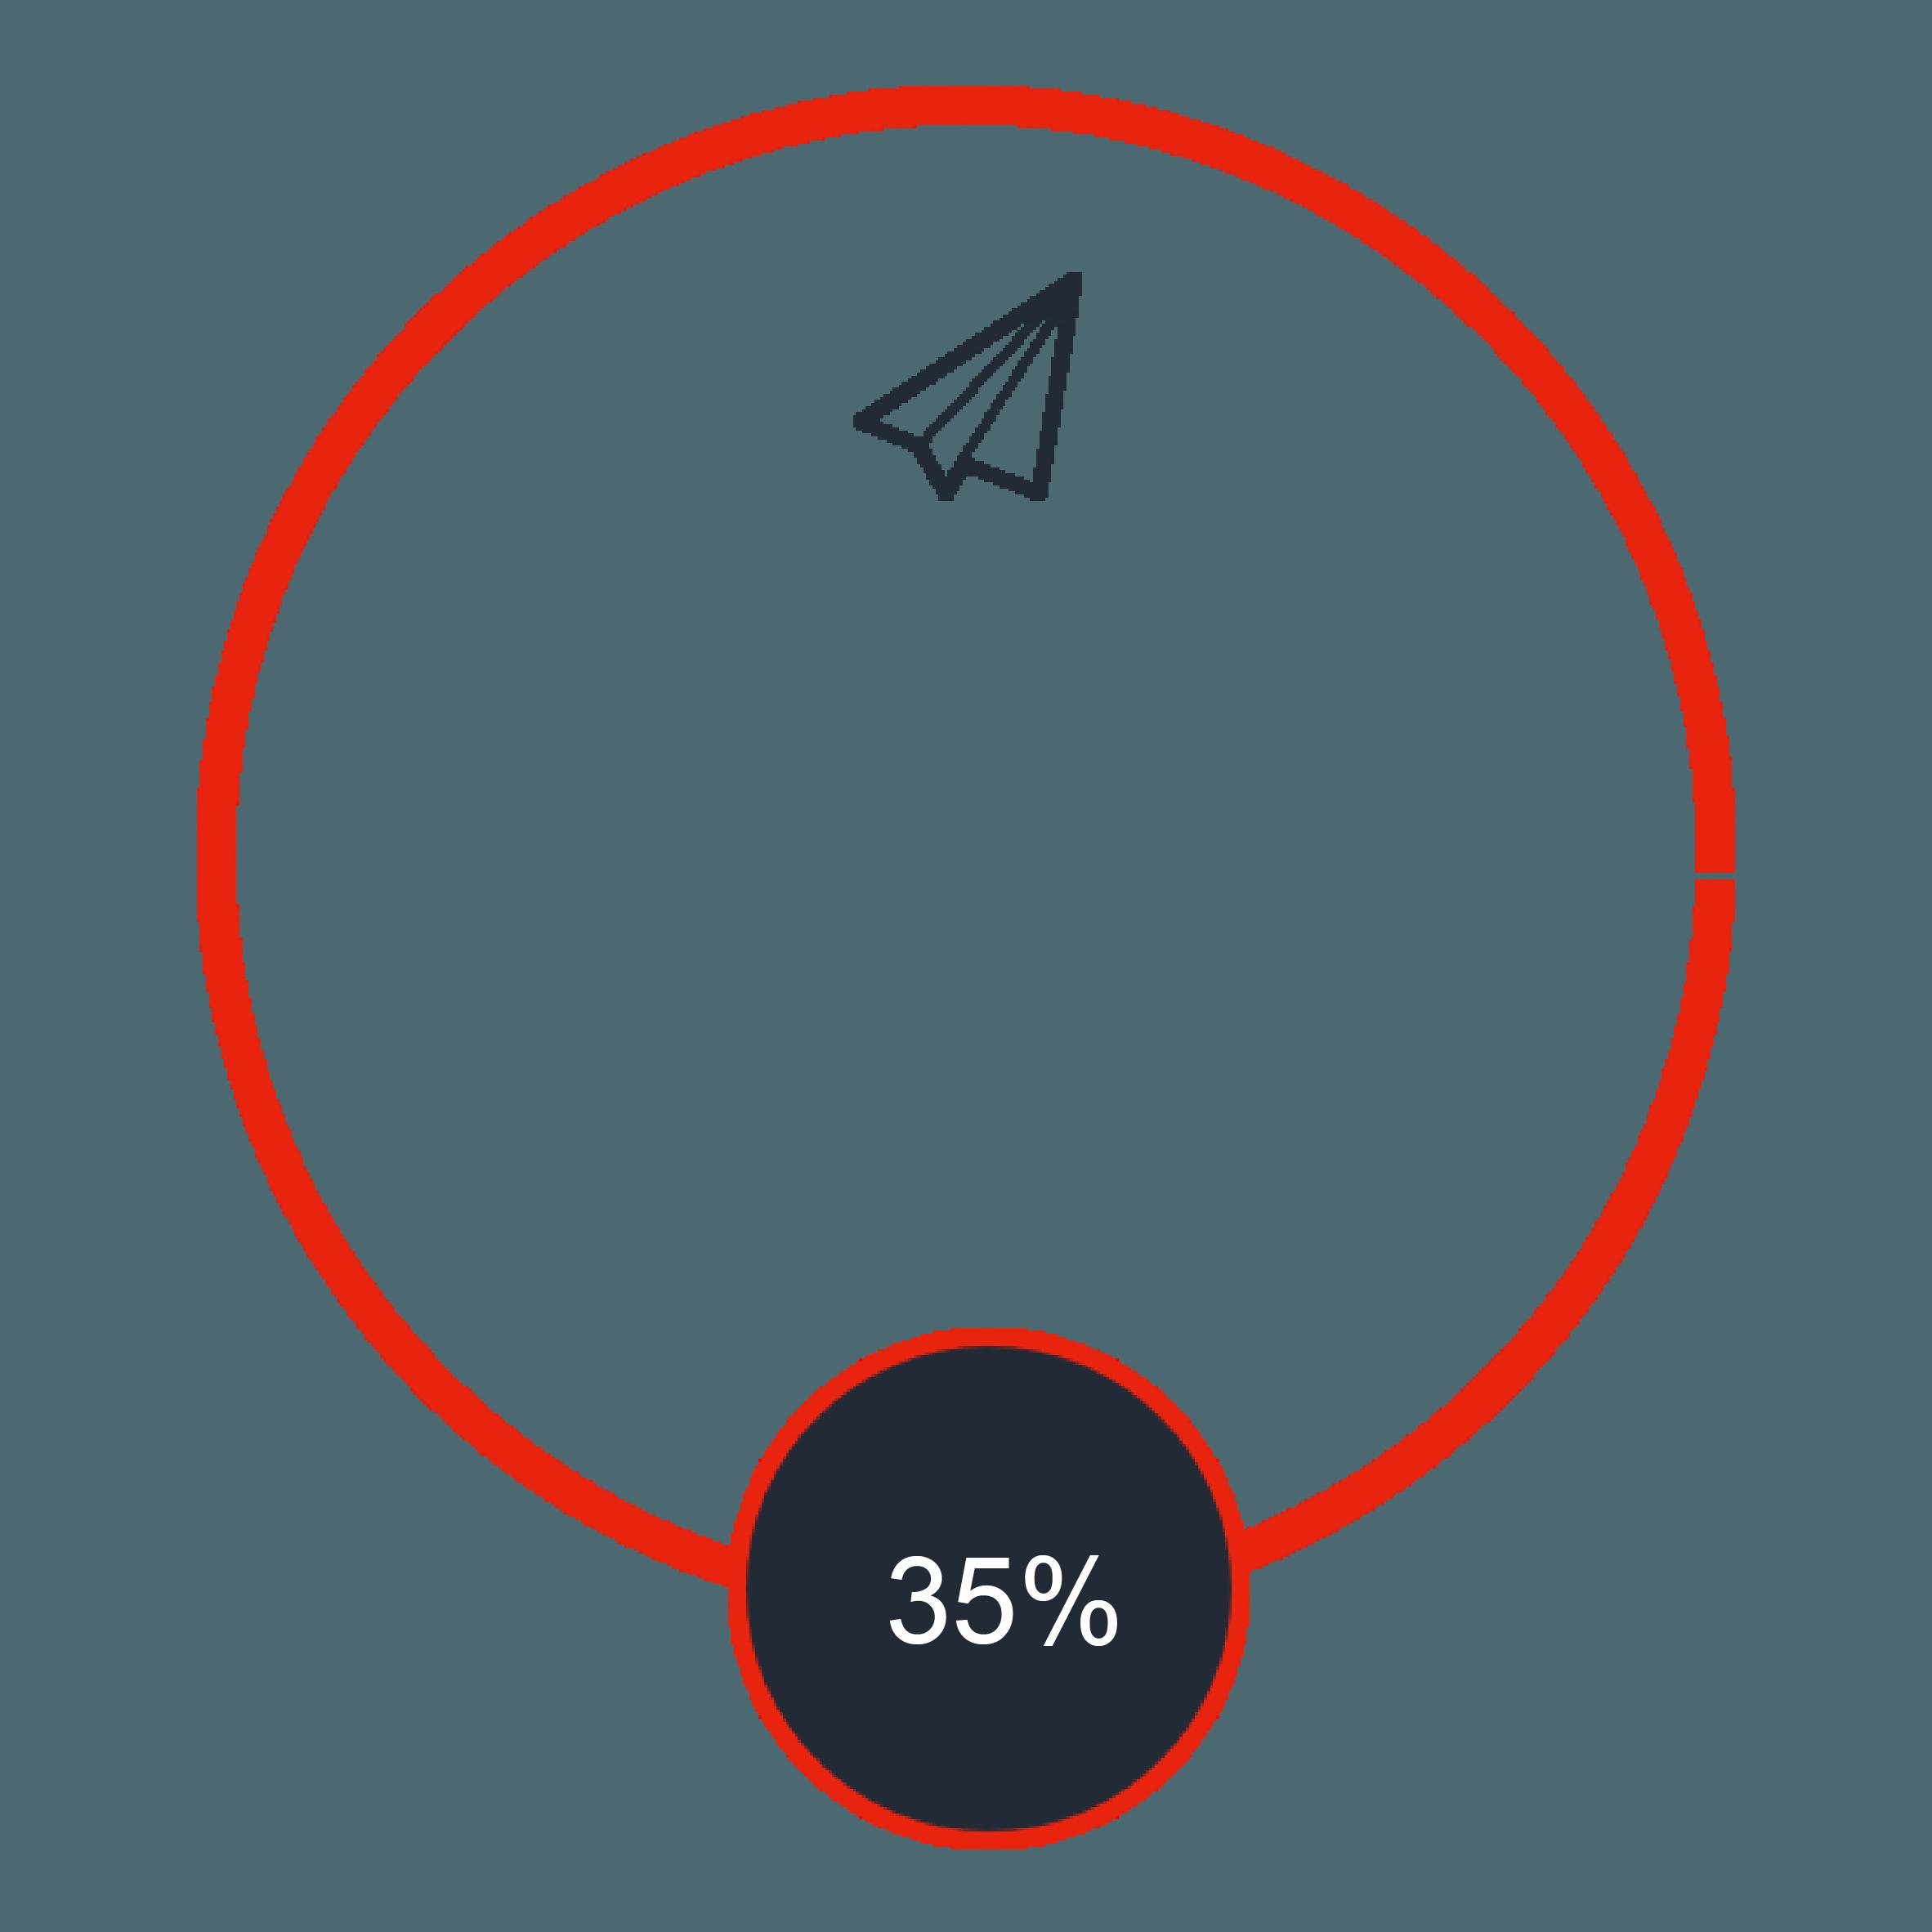 35% graph